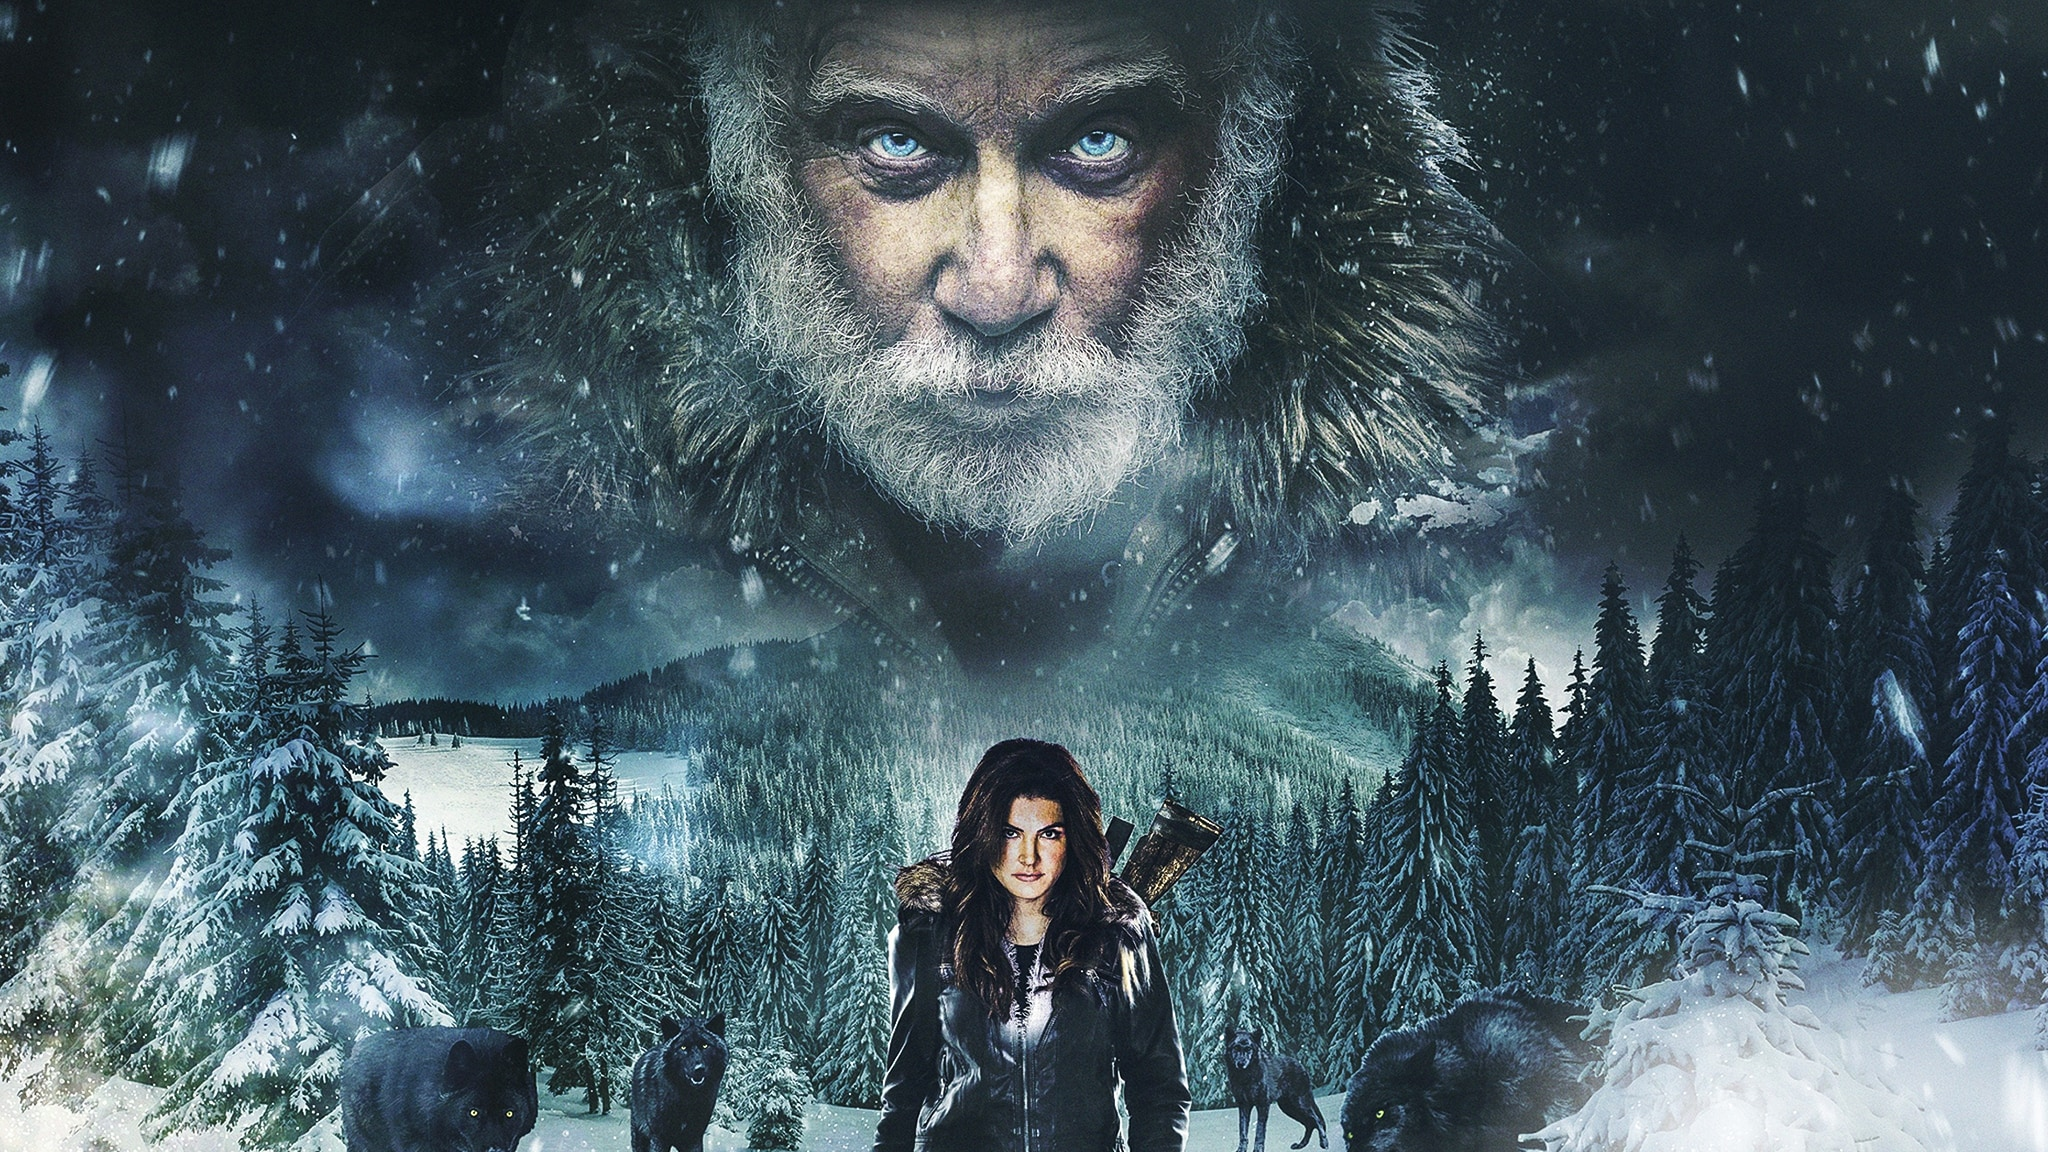 Rai 4 Daughter of the Wolf